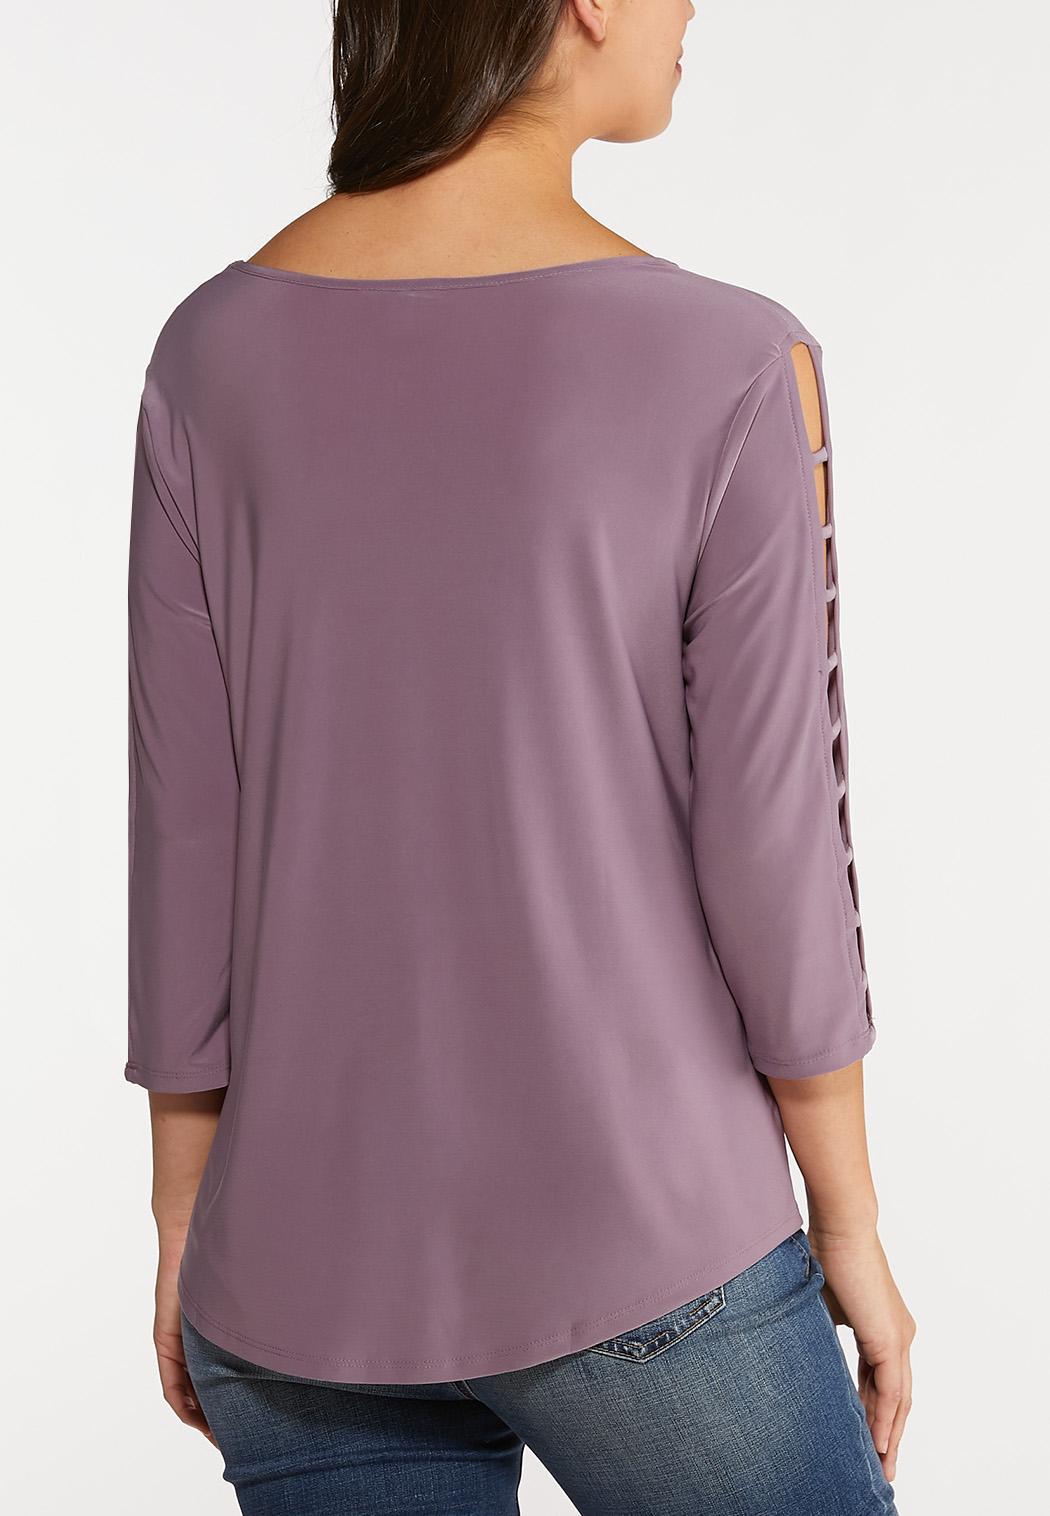 Lattice Sleeve Top (Item #44060288)